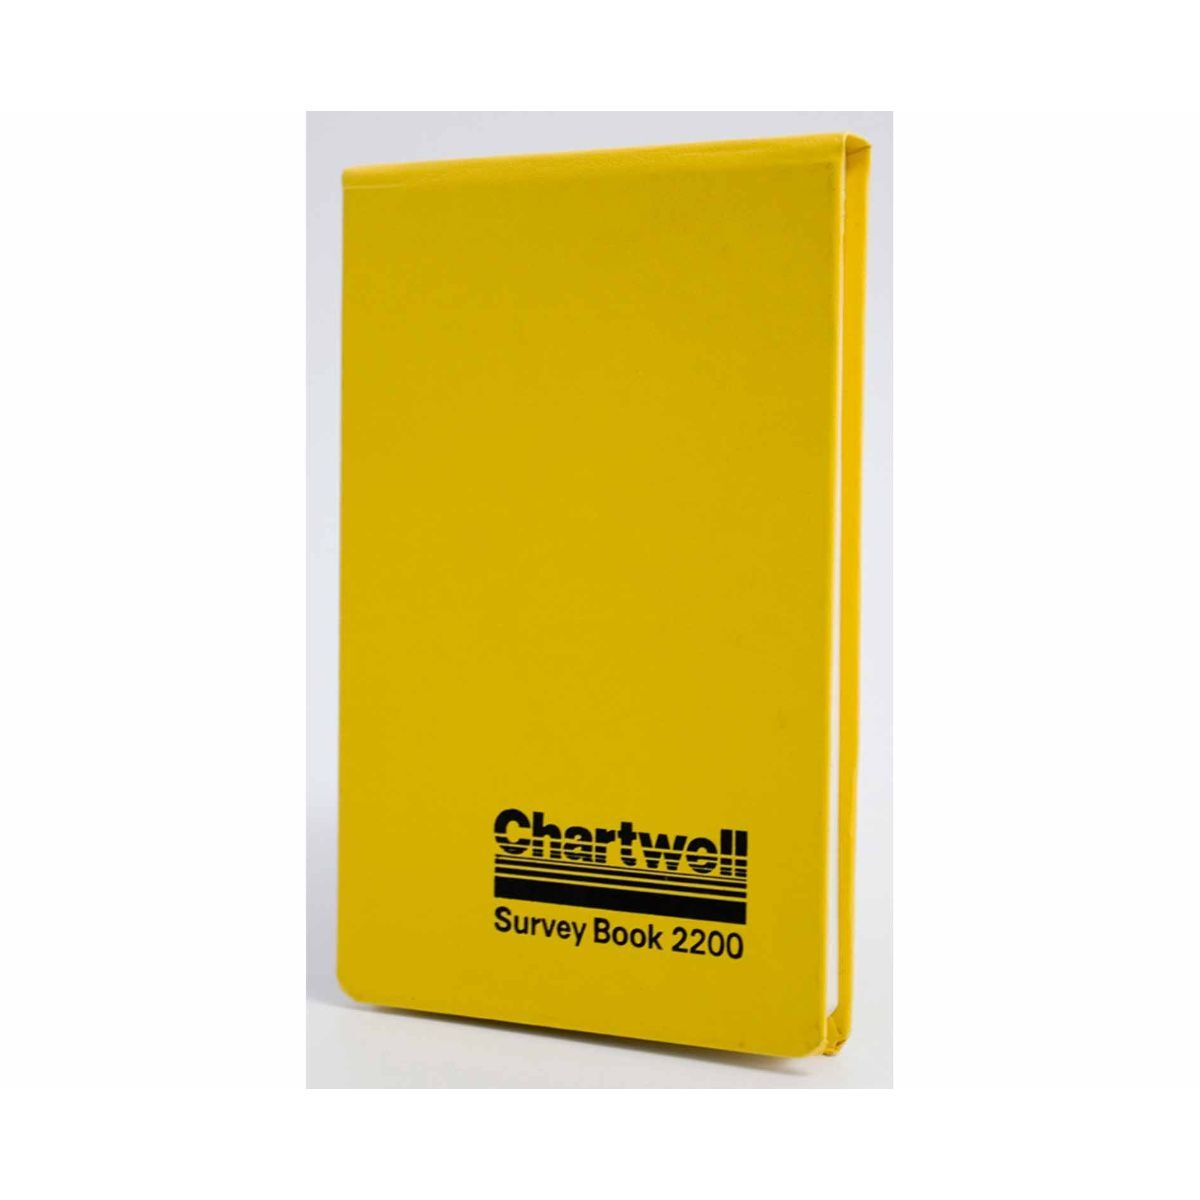 Chartwell Survey Book Plain 4x6.5 Inch